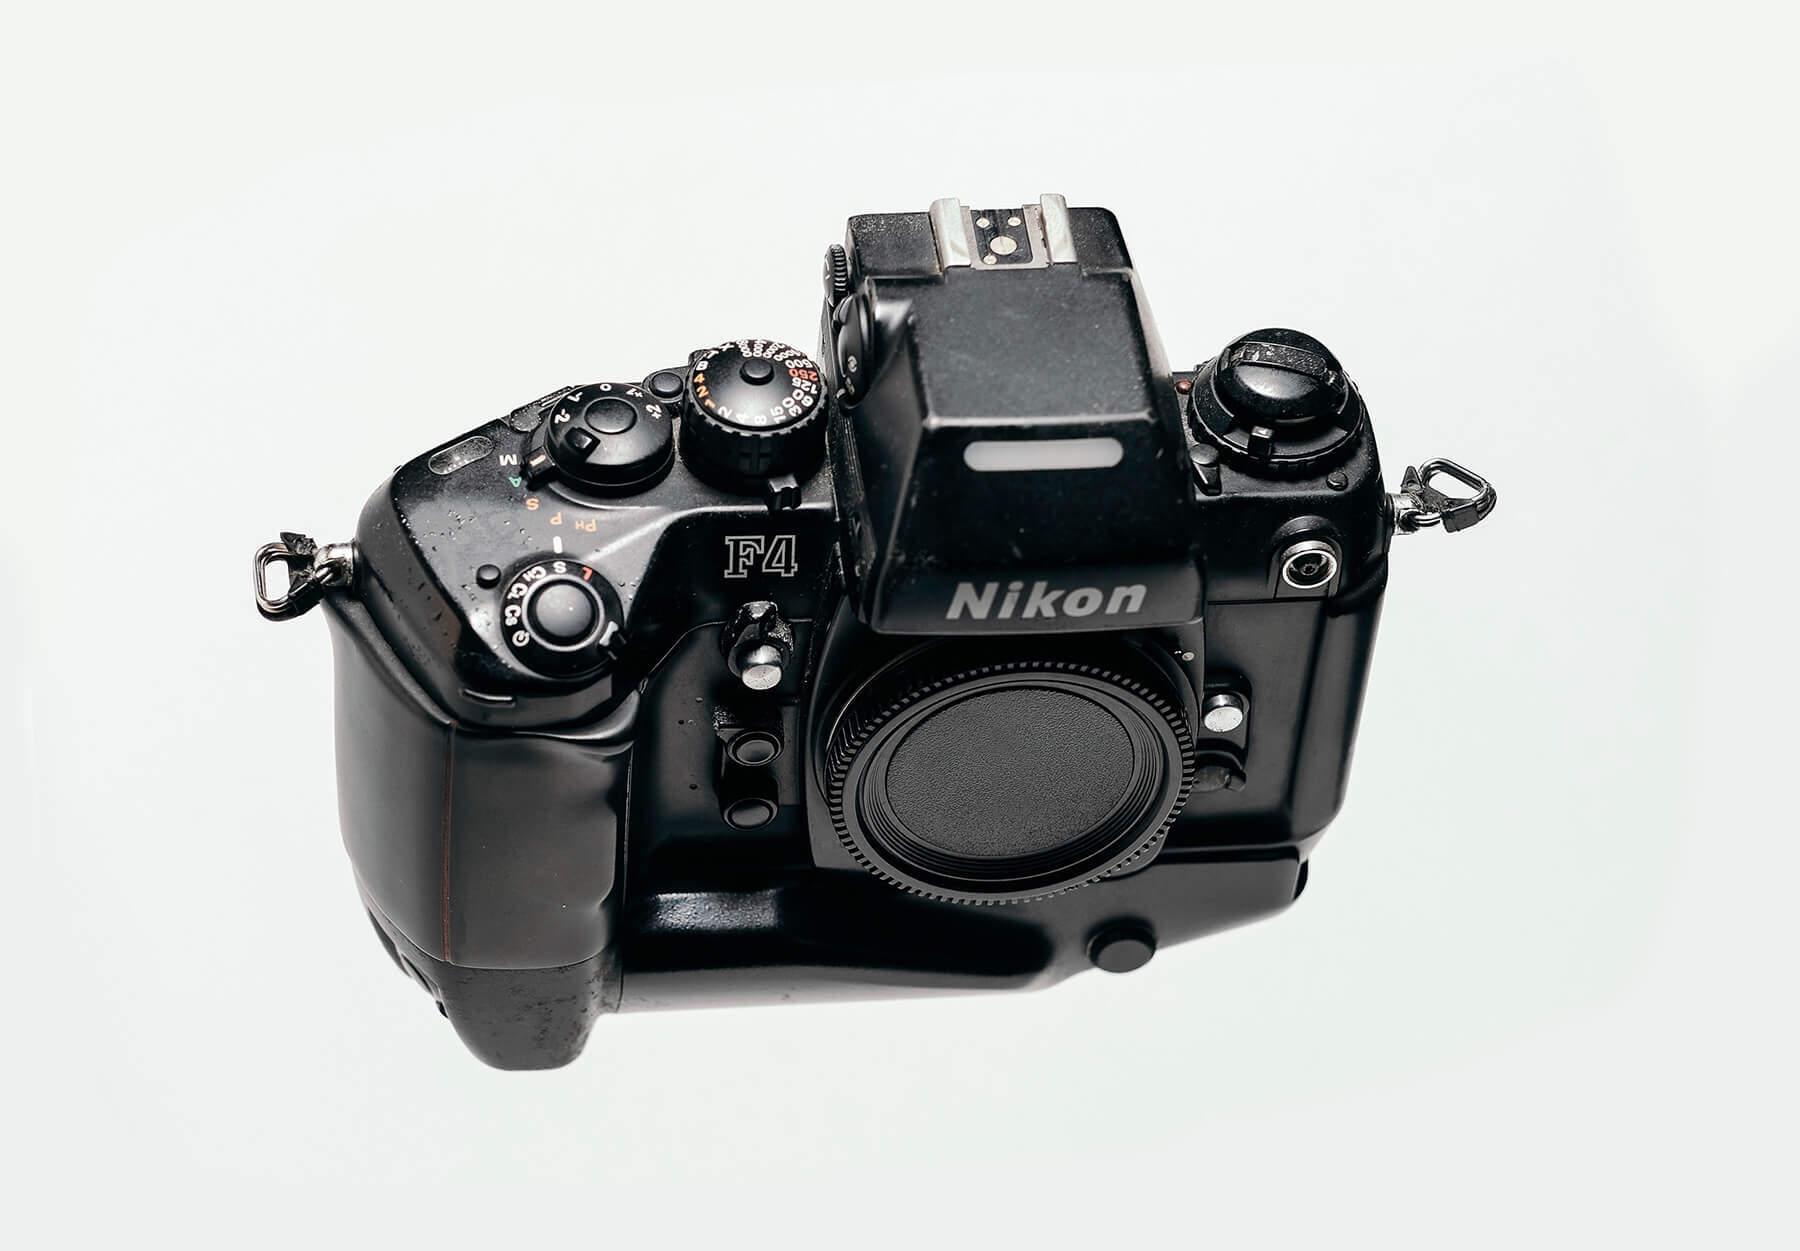 Best vintage film cameras: Nikon F4